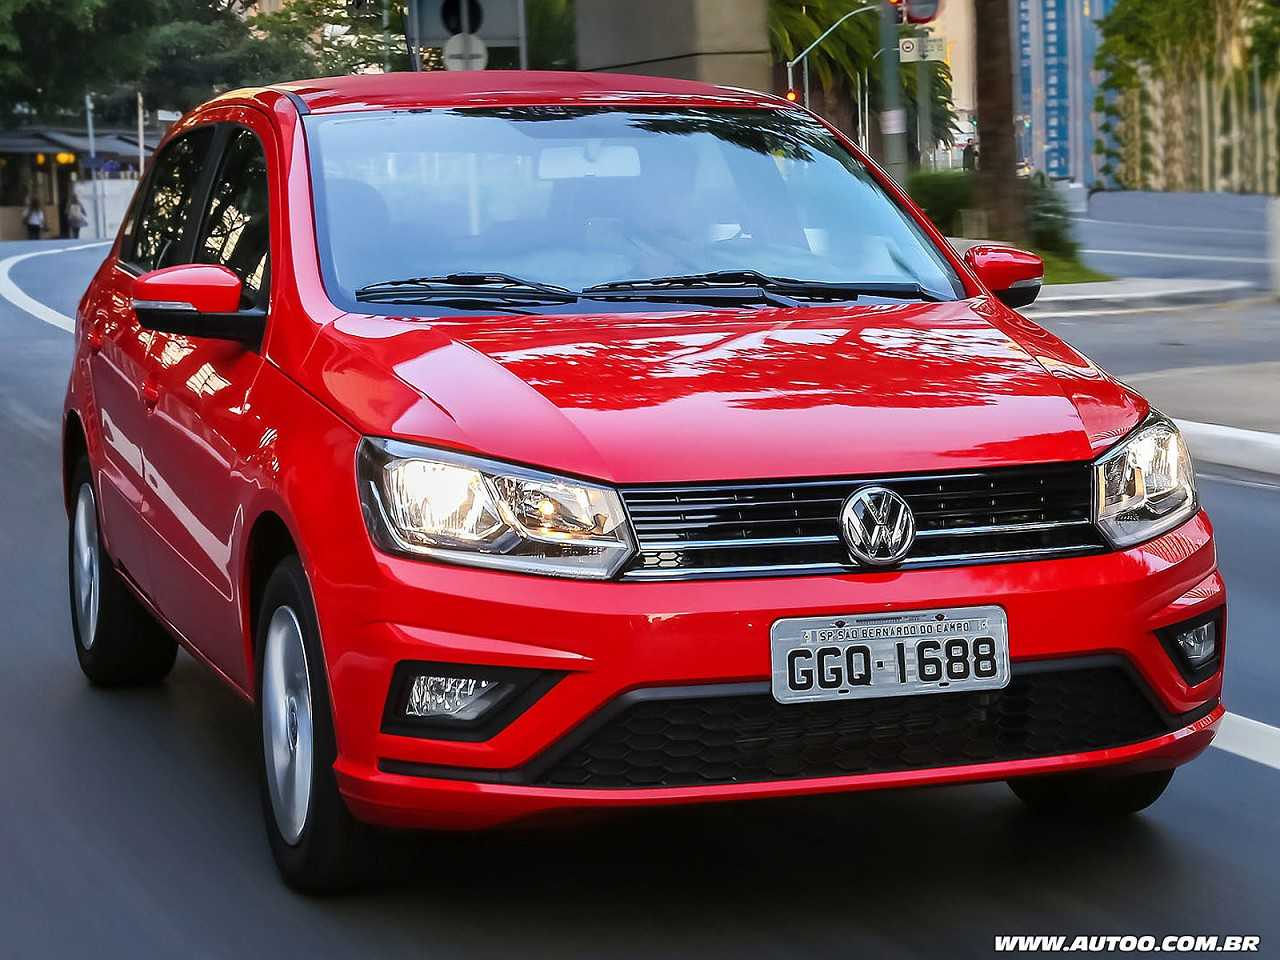 VolkswagenGol 2019 - ângulo frontal